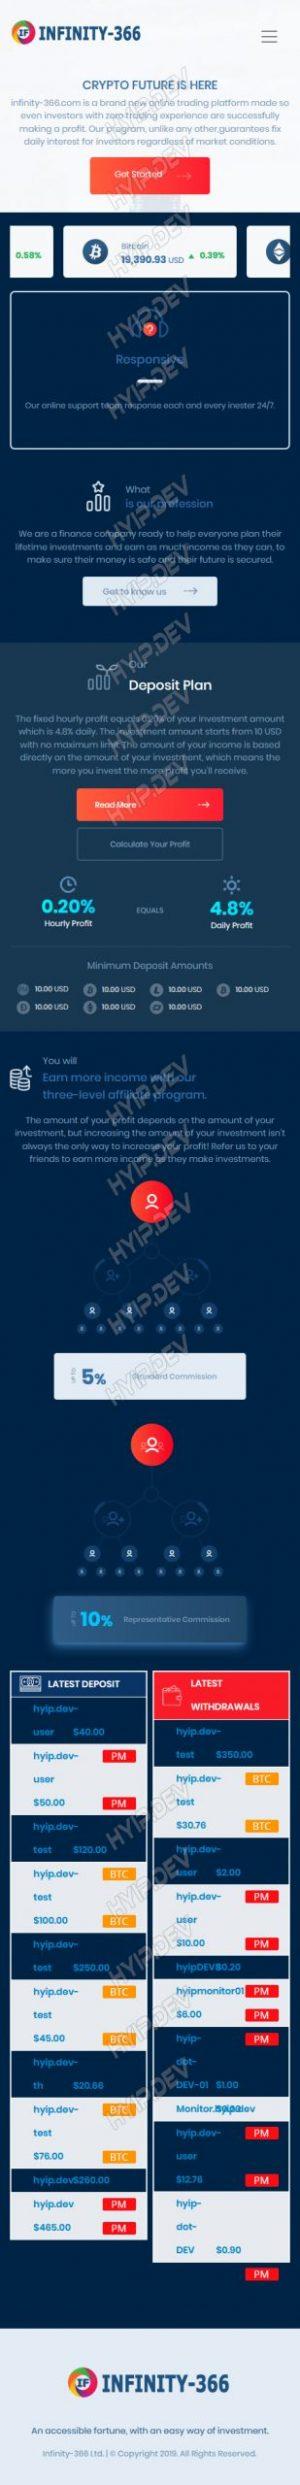 goldcoders hyip template no. 140, responsive page screenshot